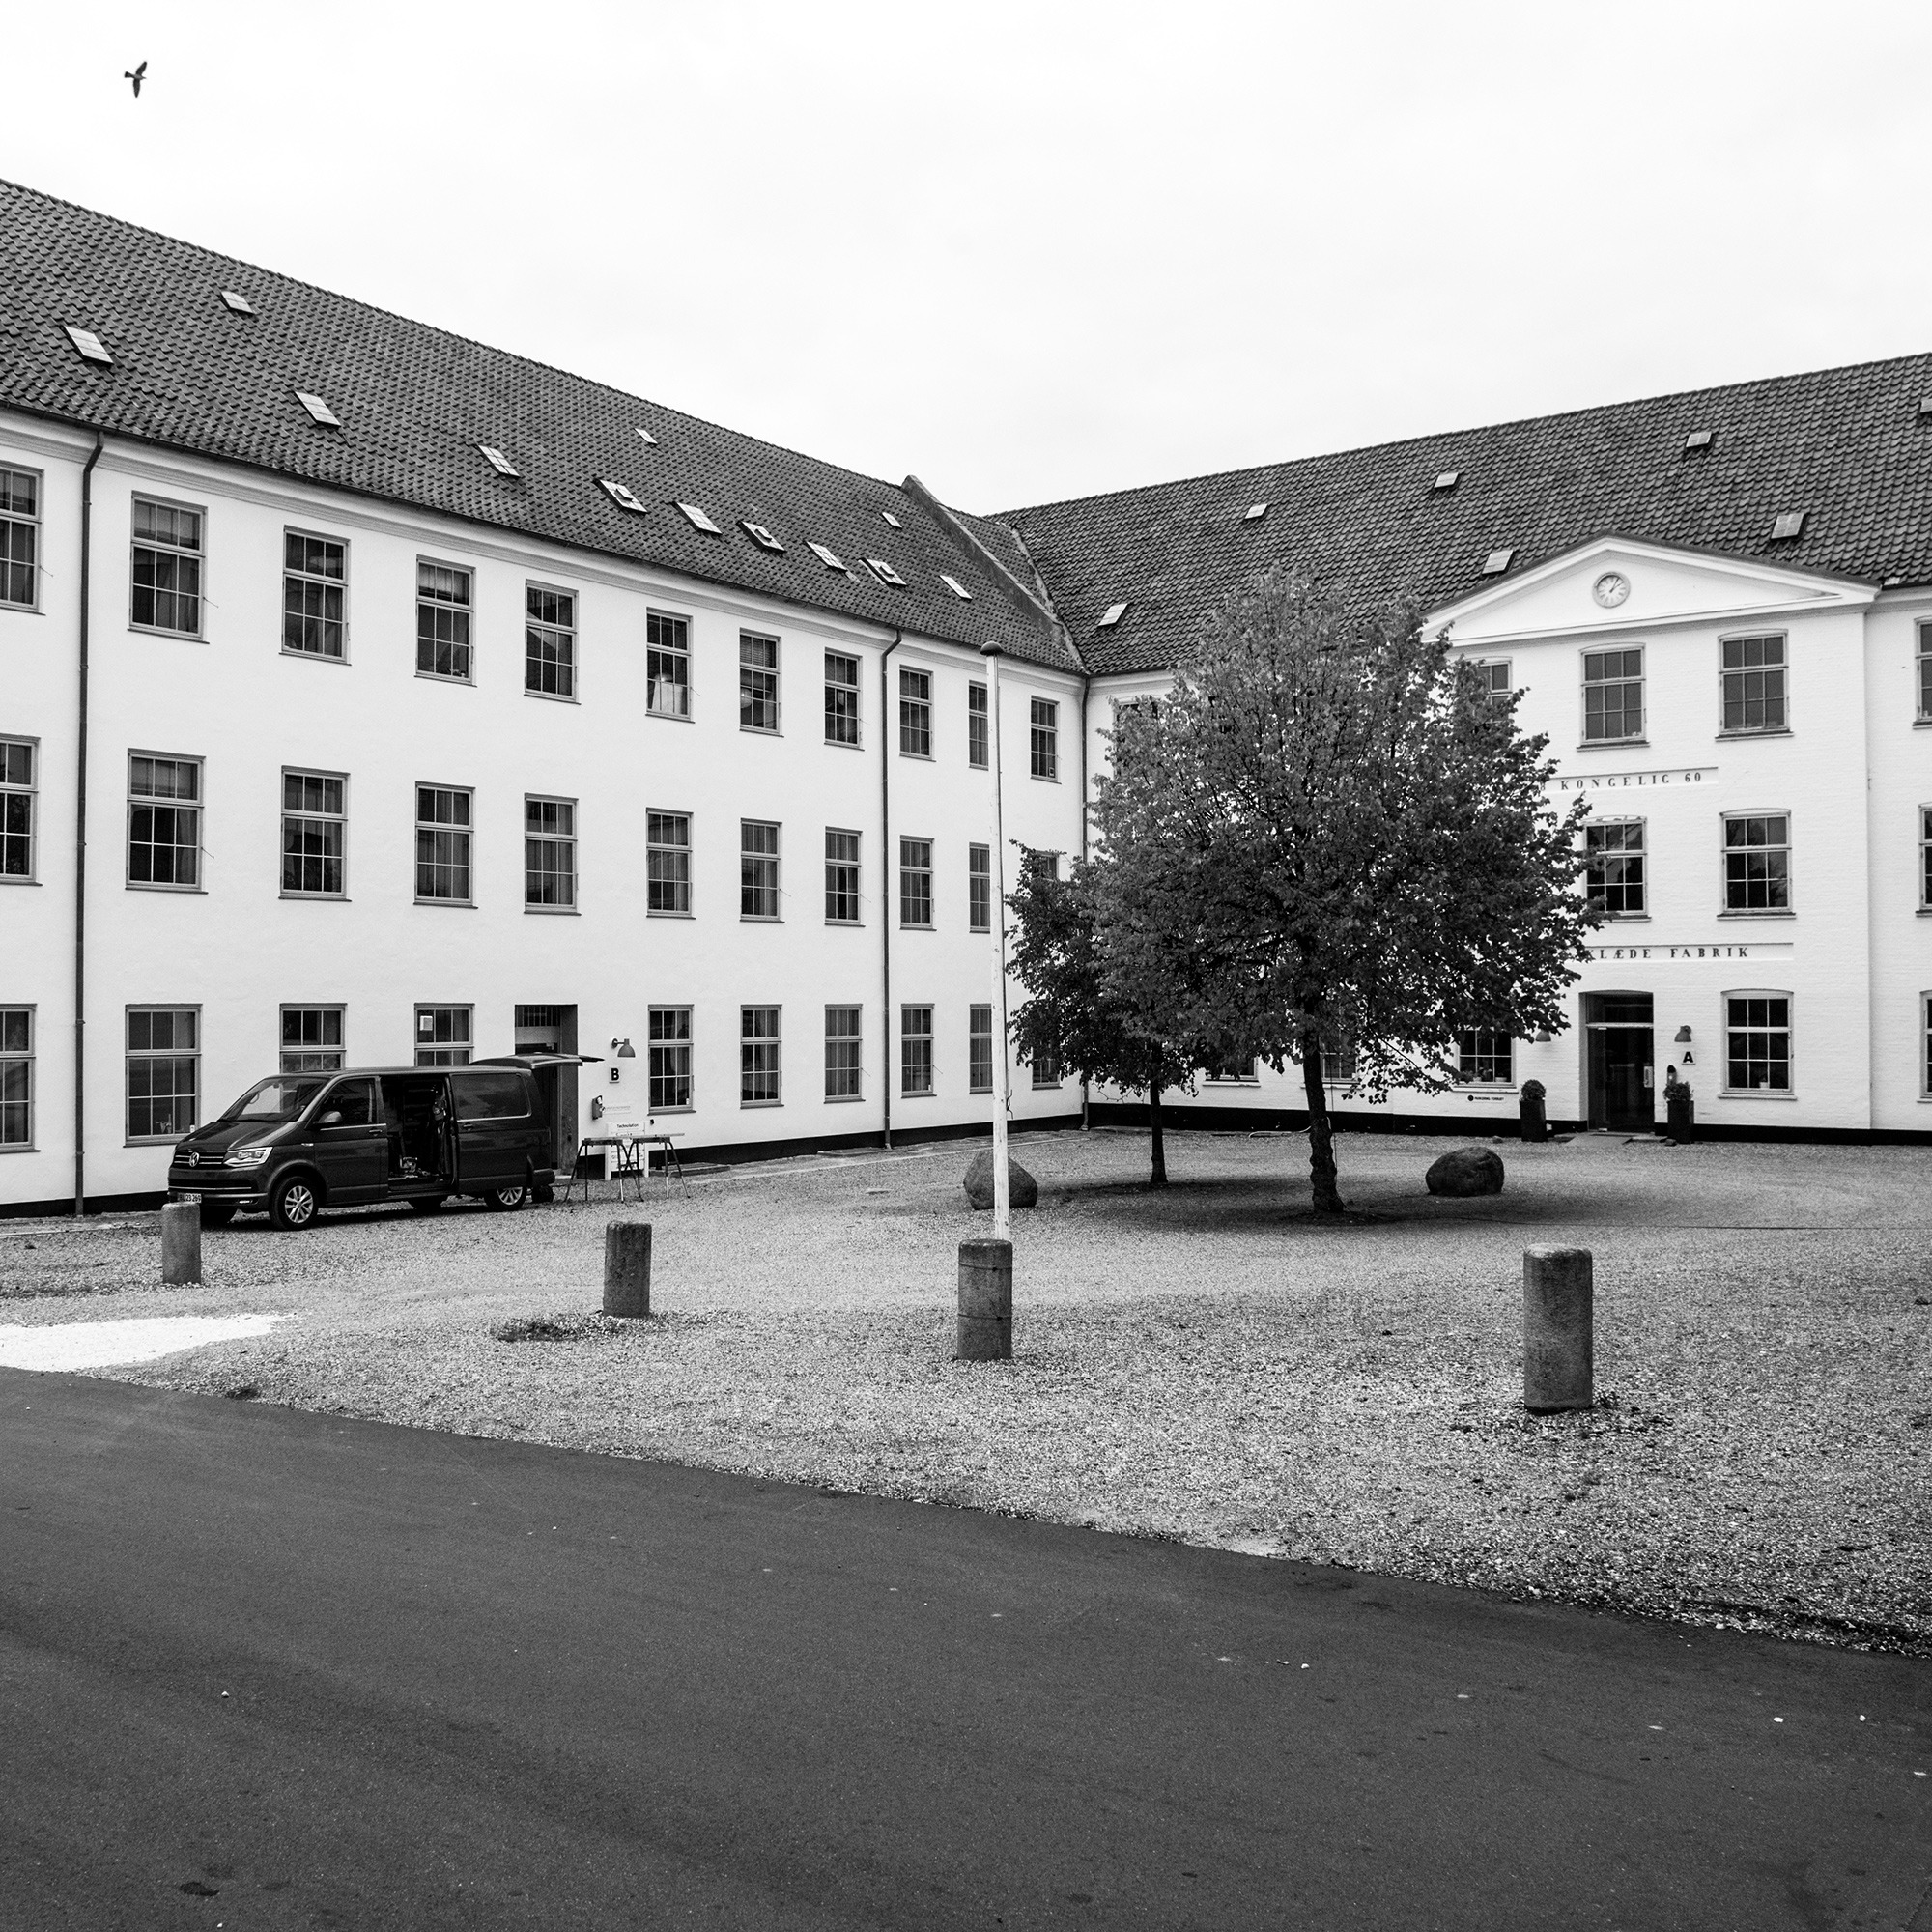 Sportsfysioterapien, Lyngsø Allé 3, bygning B, 2970 Hørsholm